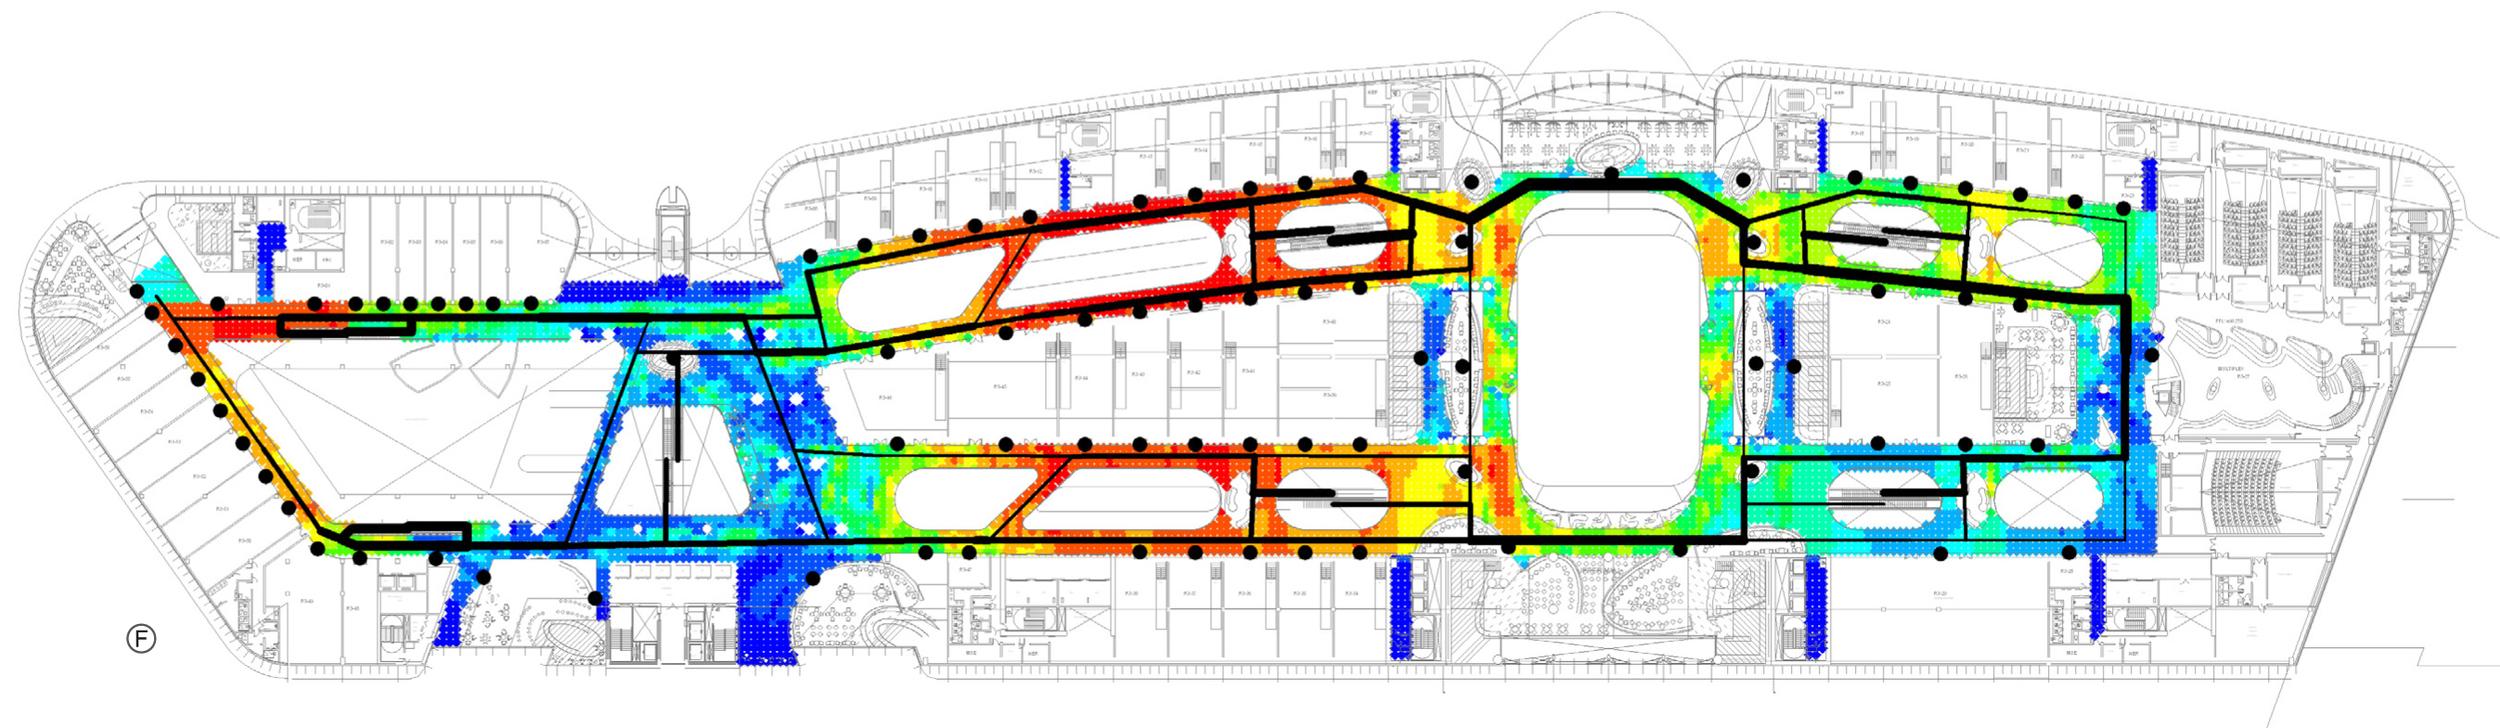 338-110727-Aeron Detailed Design Report (300dpi)-53.jpg